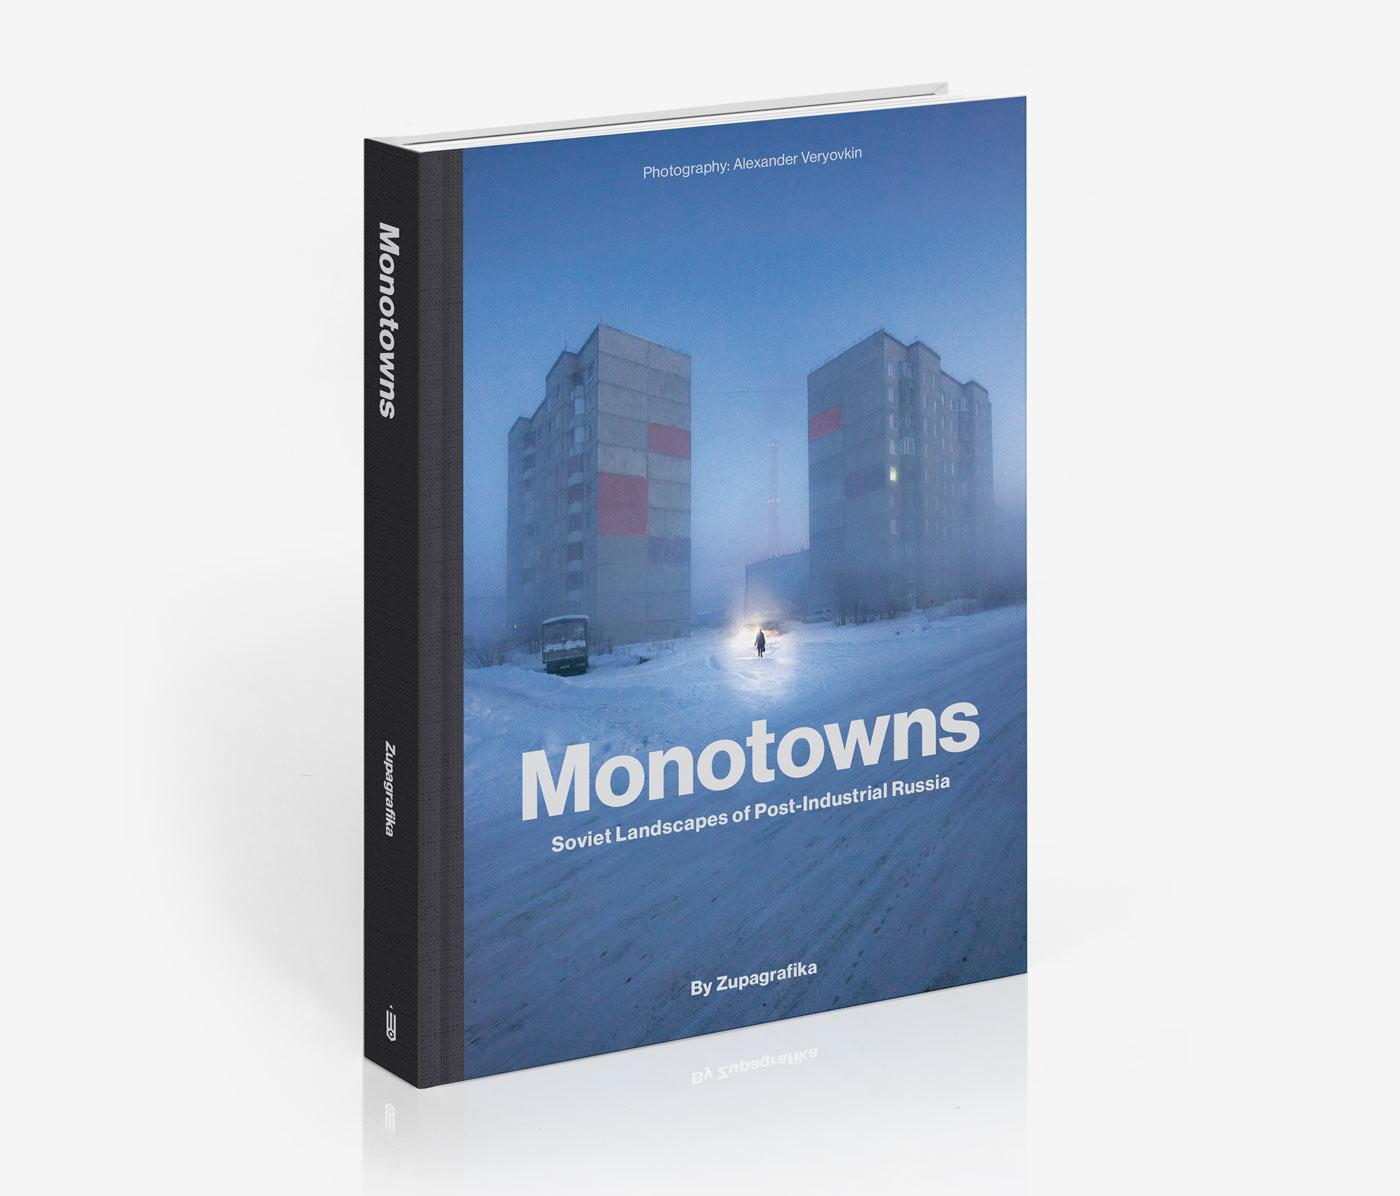 Monotowns book by Zupagrafika and Alexander Veryovkin